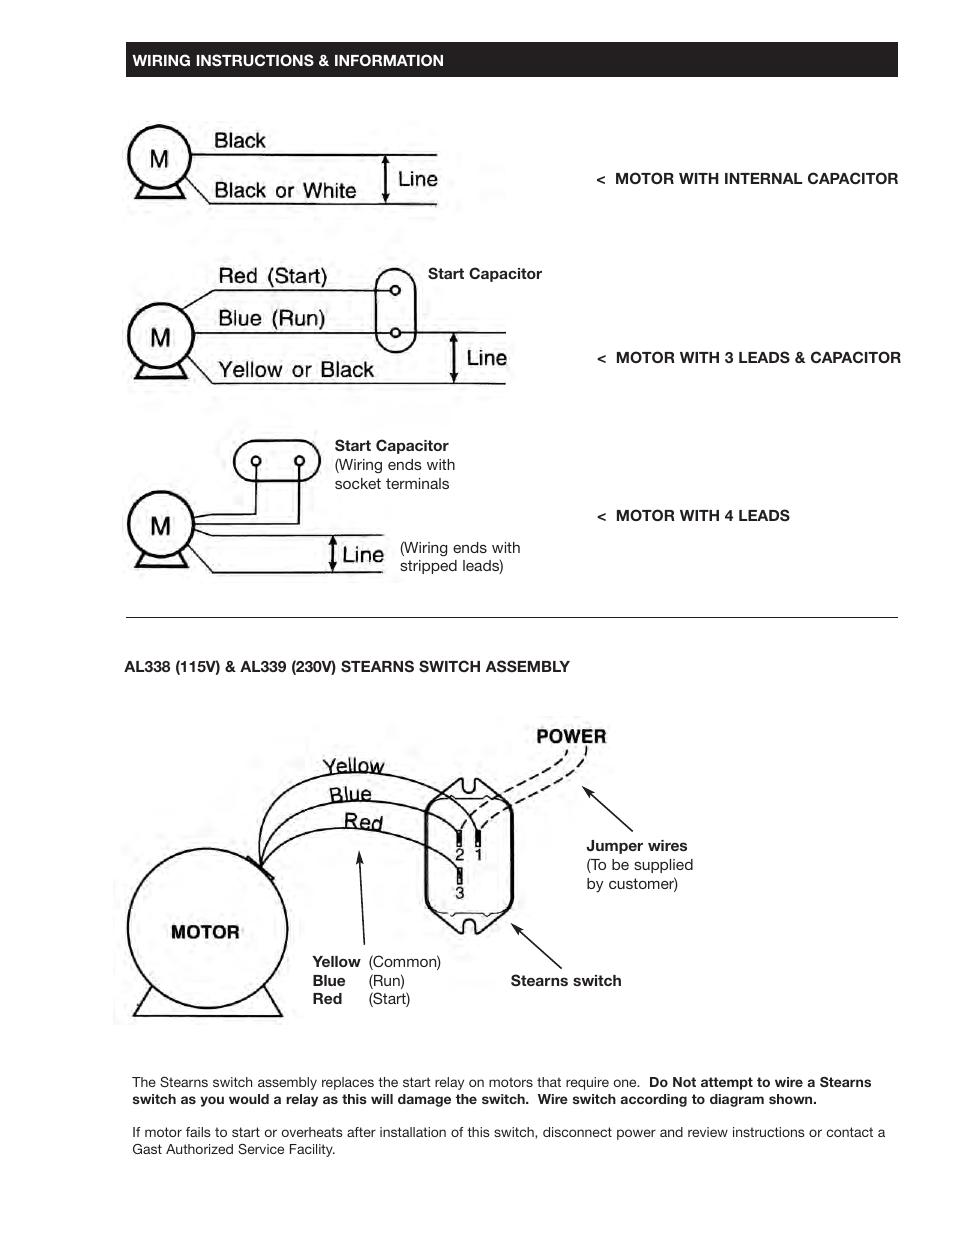 gast 1534 series oilless vacuum pumps and compressors user manual rh manualsdir com Century Motor Wiring Diagram Three-Phase Motor Wiring